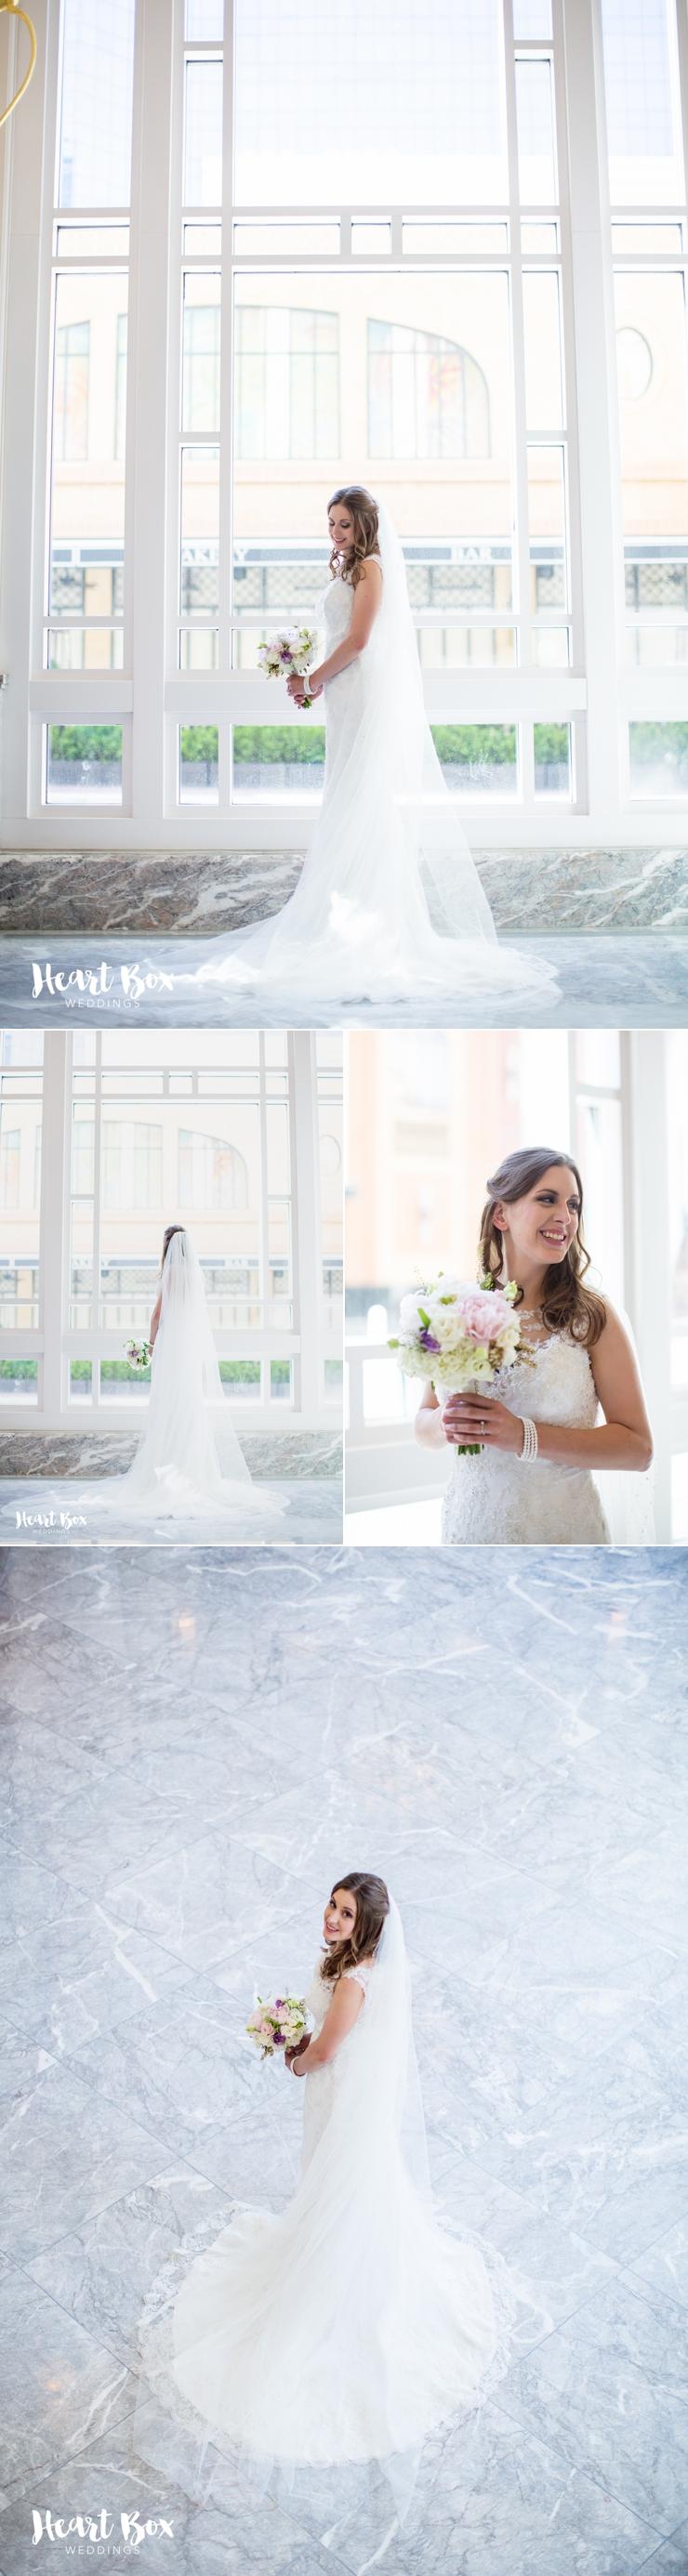 Sarah Lubrano Bridal Blog Collages 2.jpg